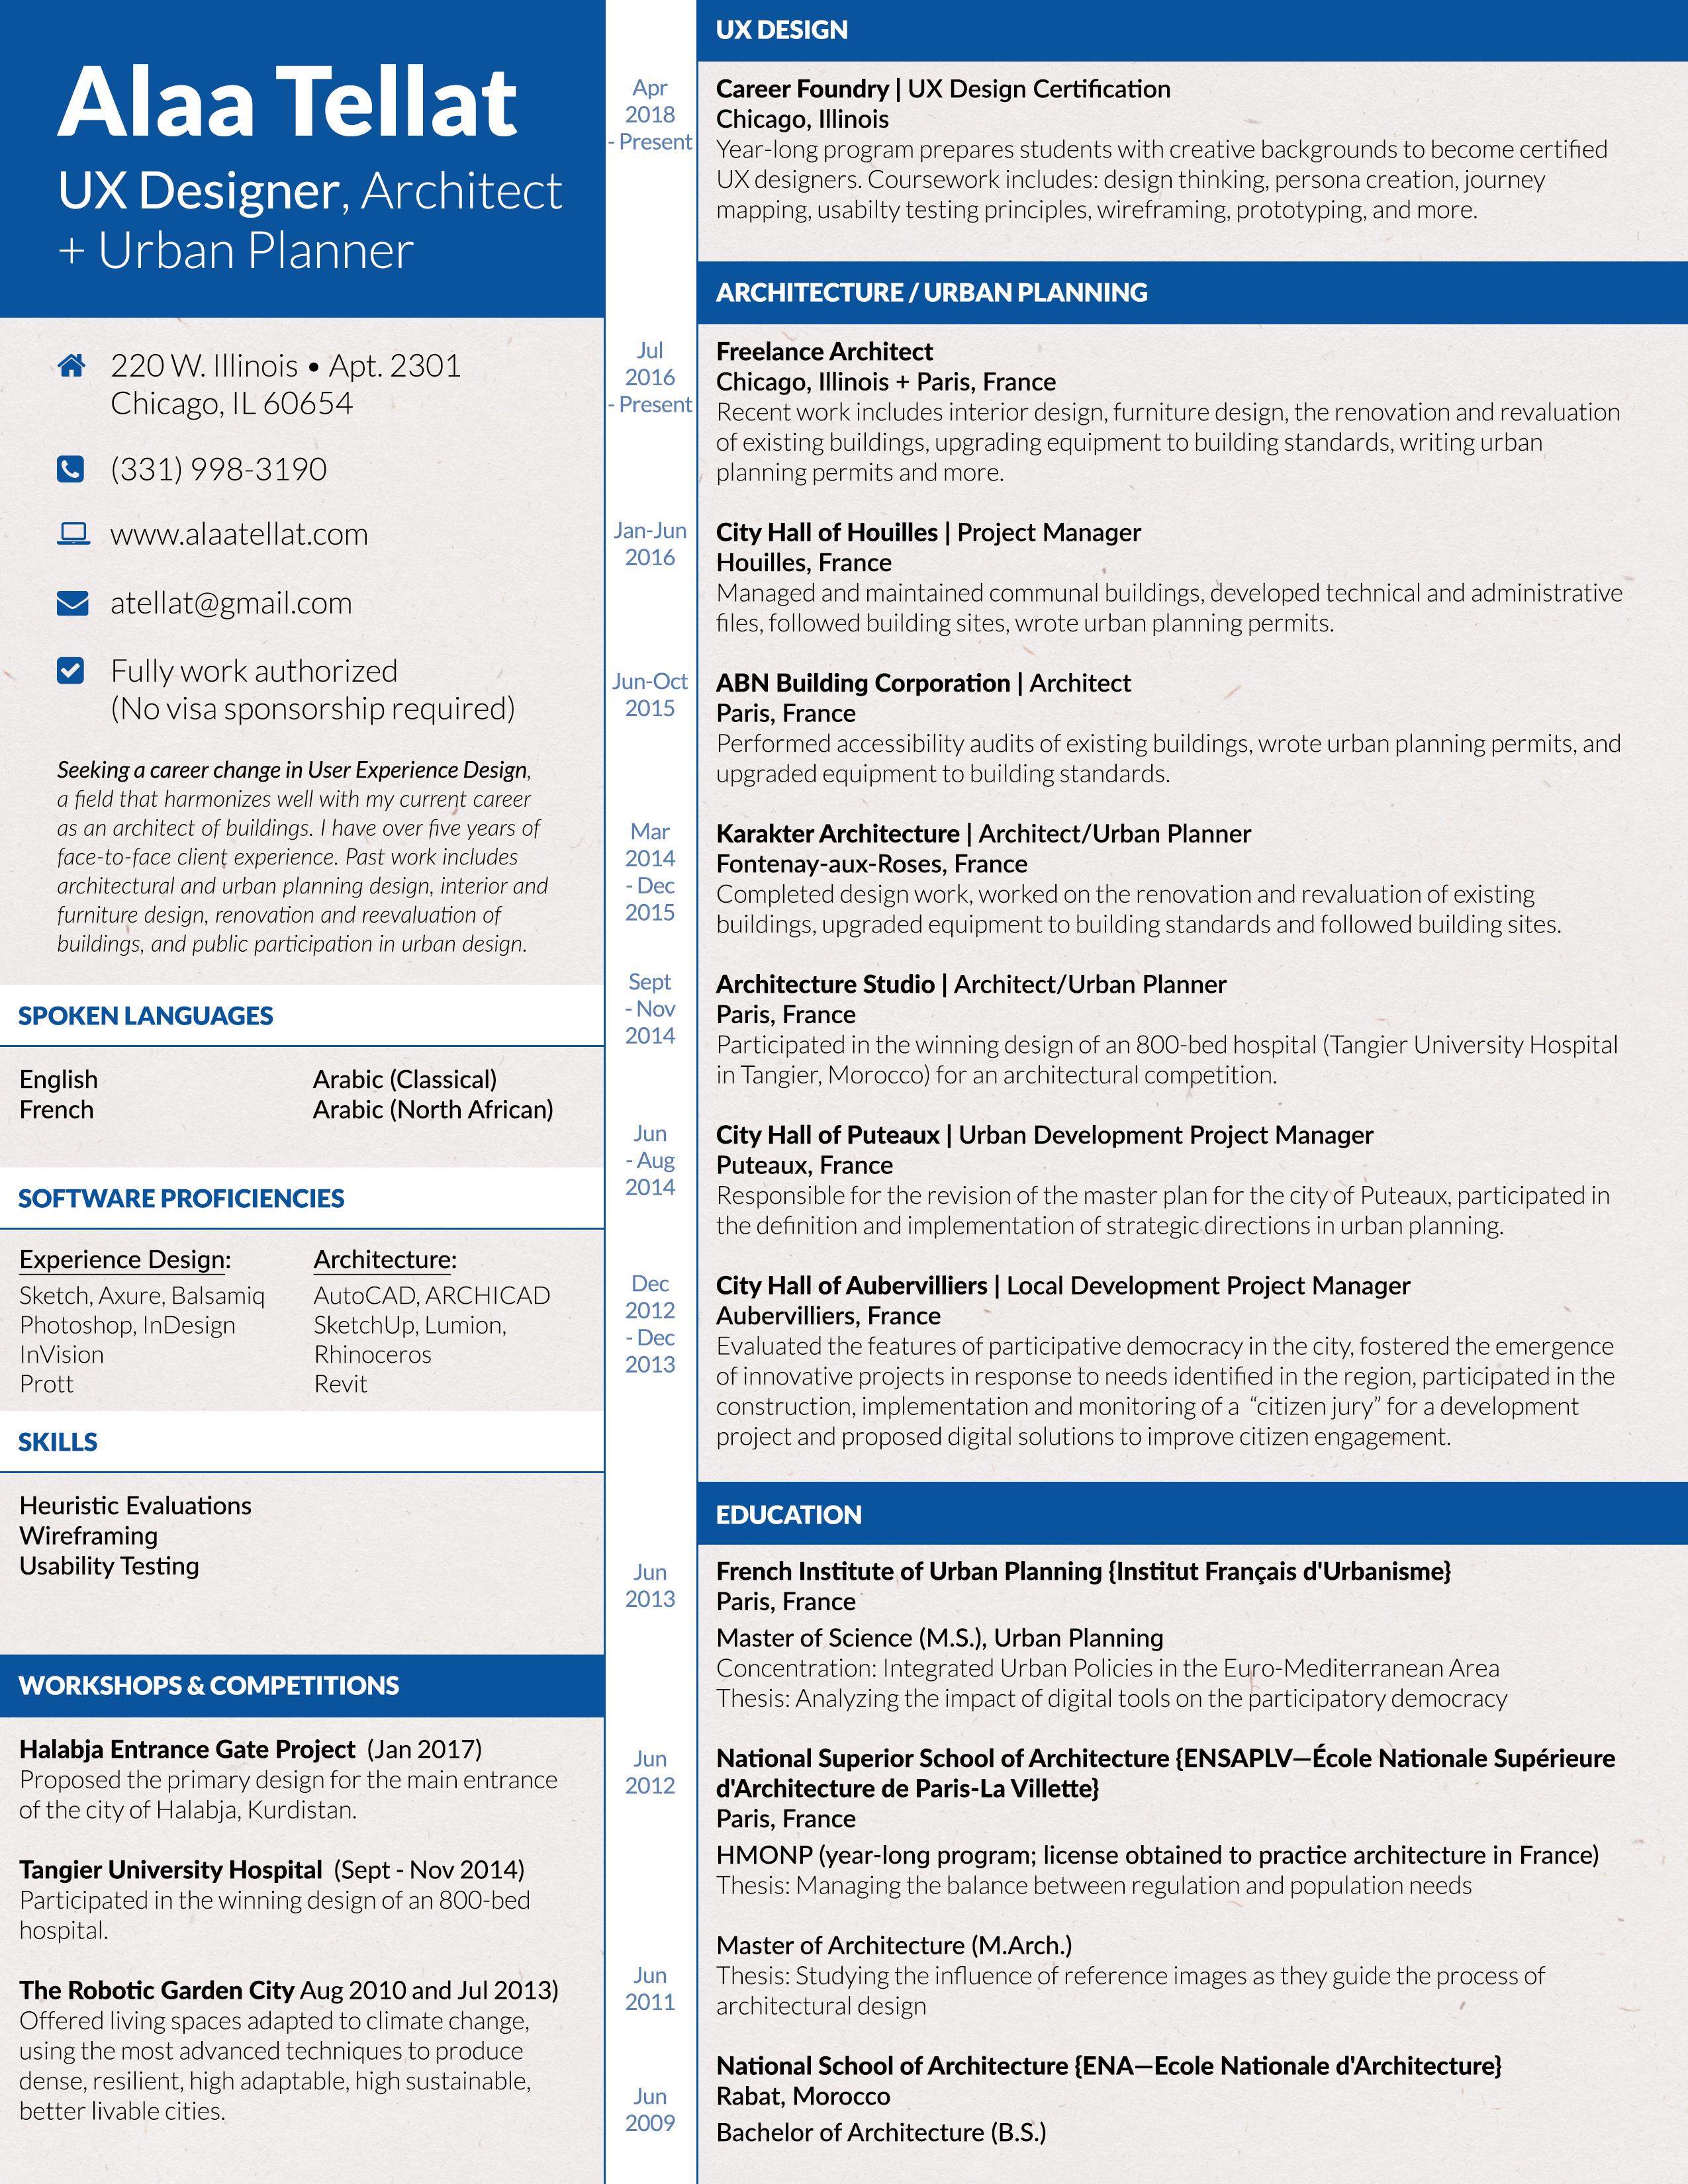 Essaytyper mobile service schedule printable calendar